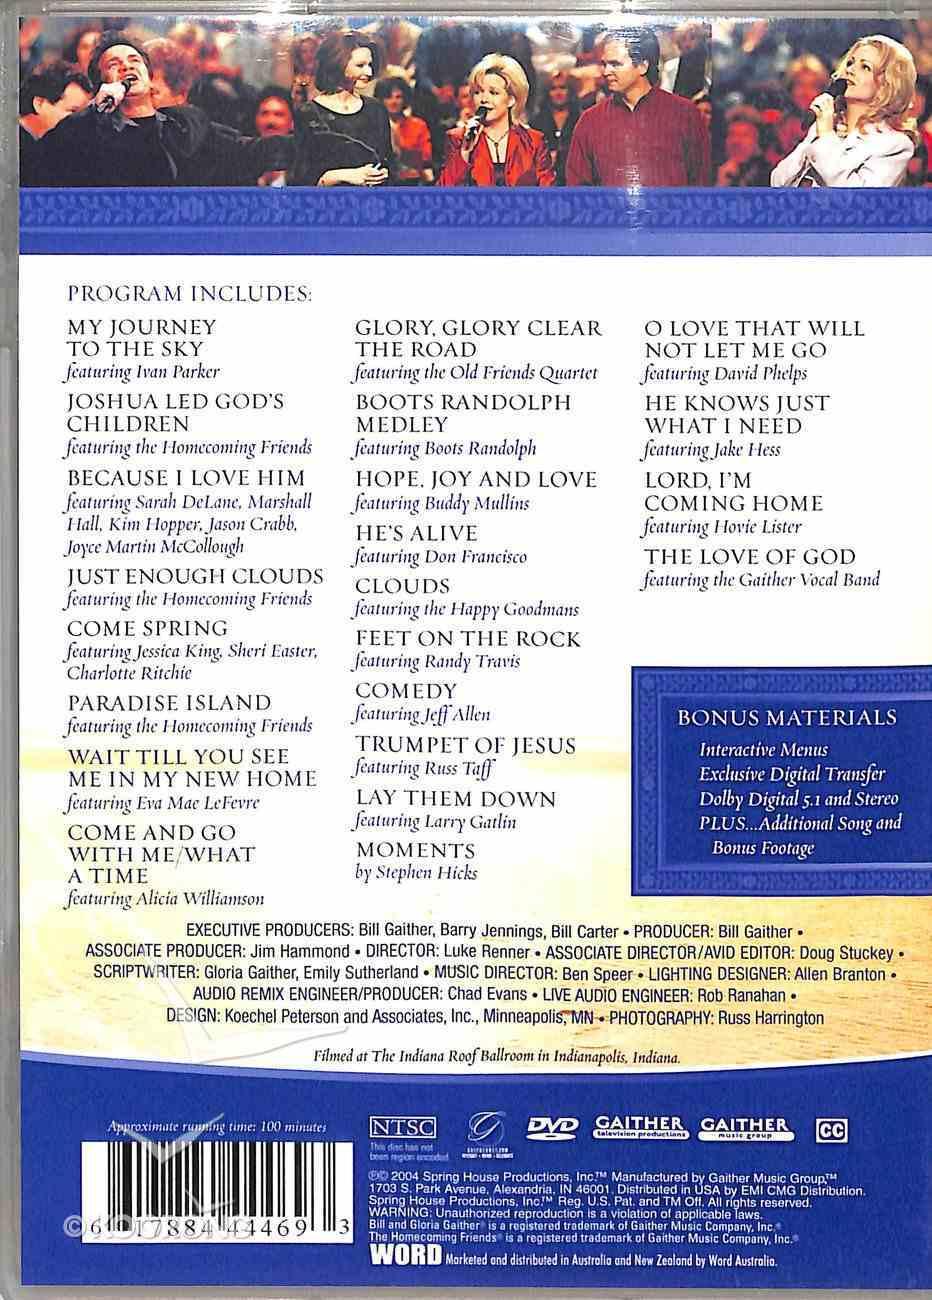 Journey to the Sky (Gaither Gospel Series) DVD